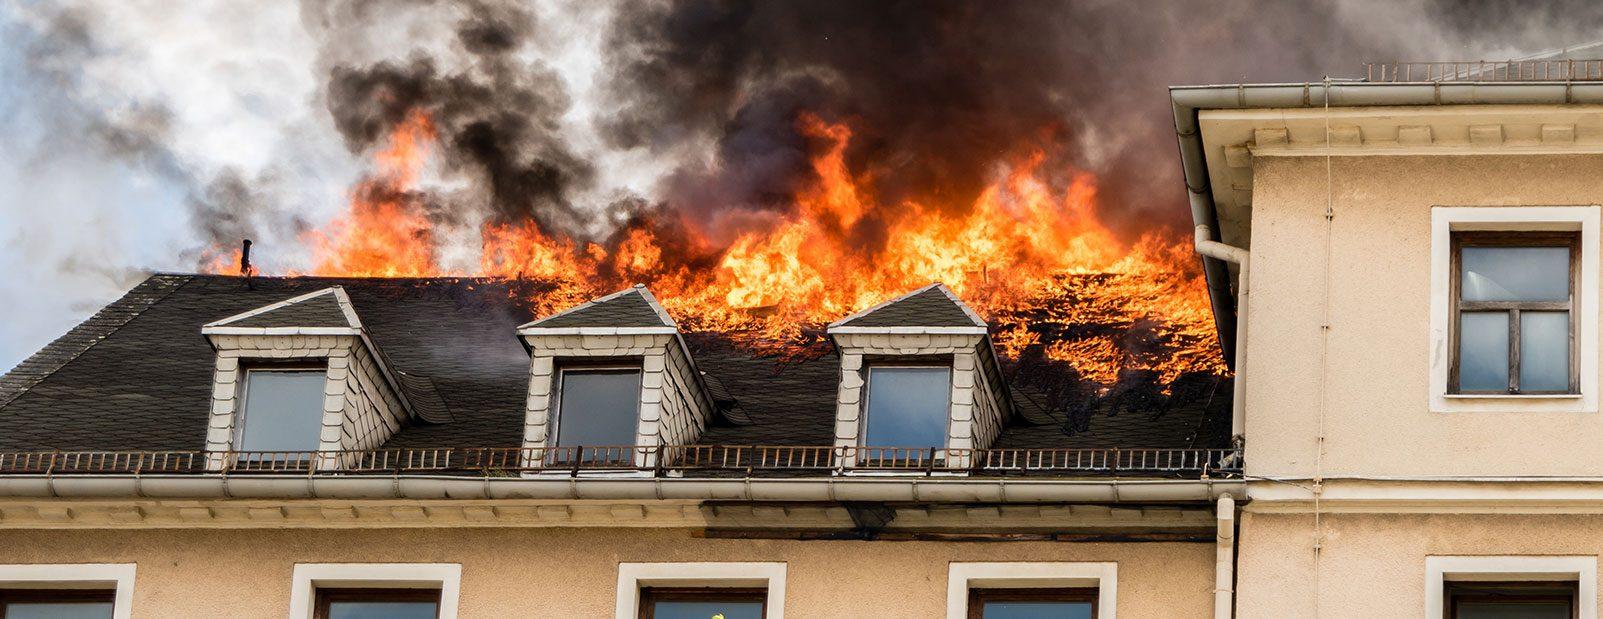 California Wildfire Smoke Has Weakened the Generation of Solar Energy